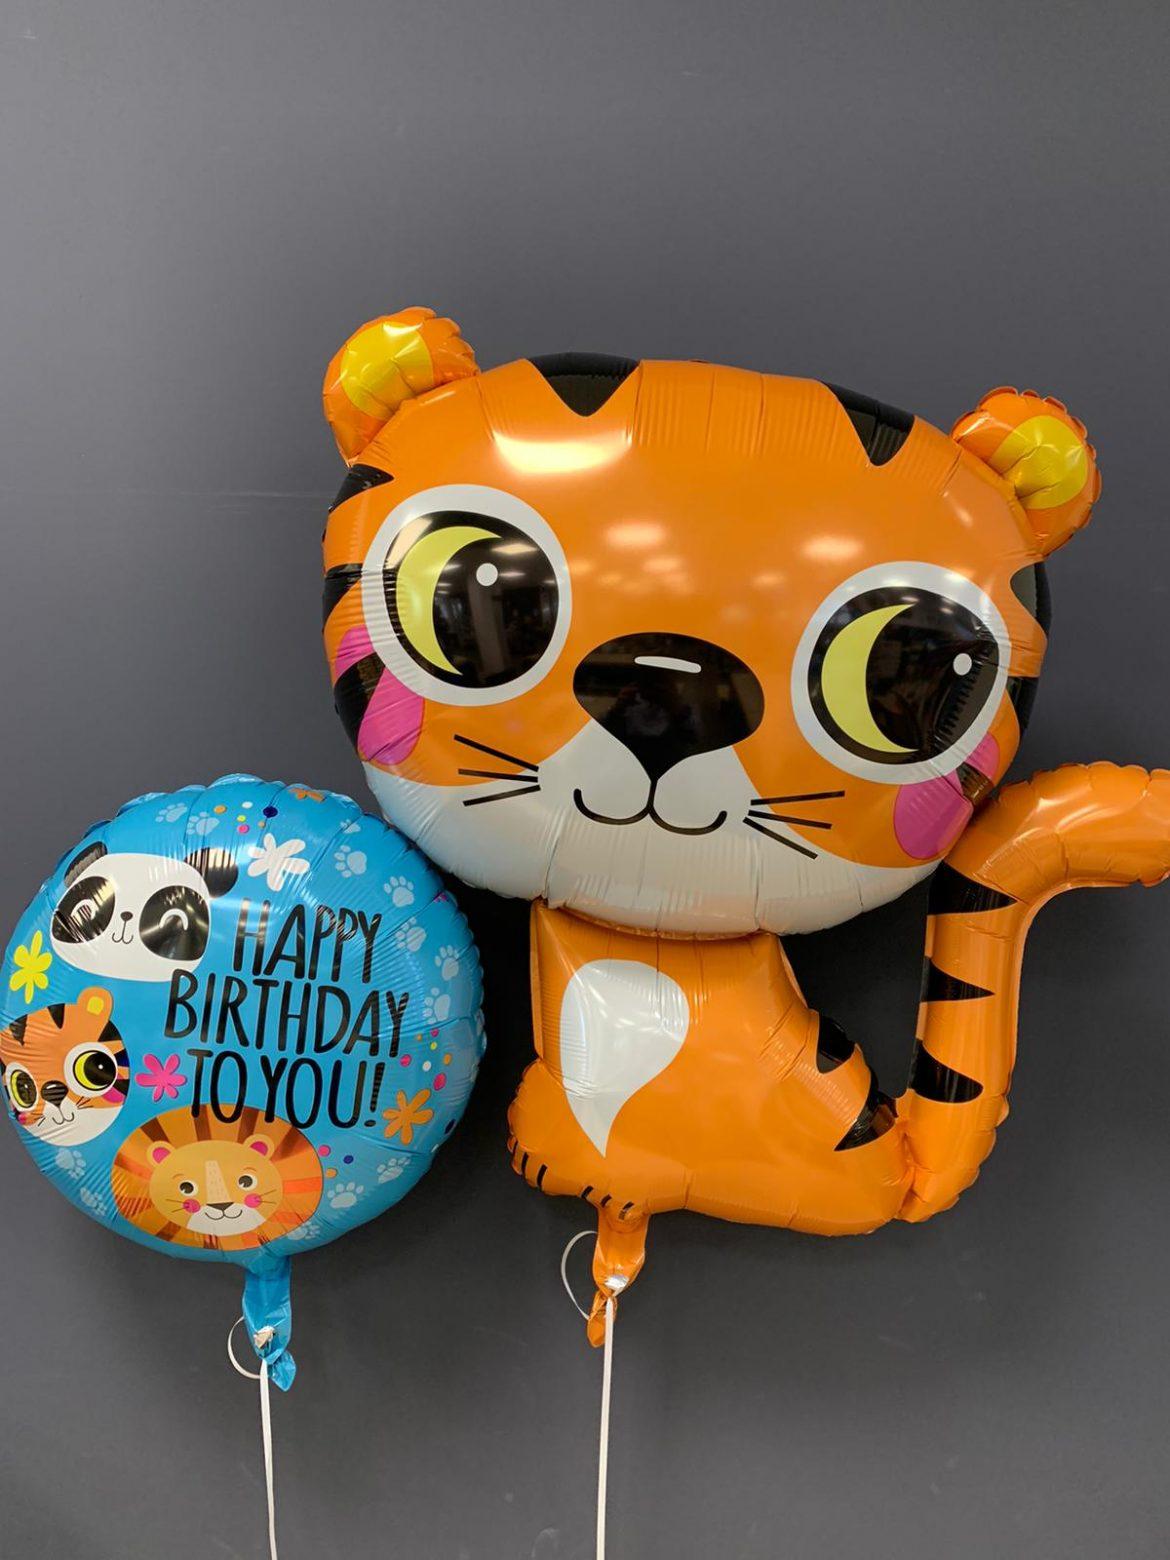 Tiger Folienballon €6,90<br />Geburtstagsballon € 5,50 1